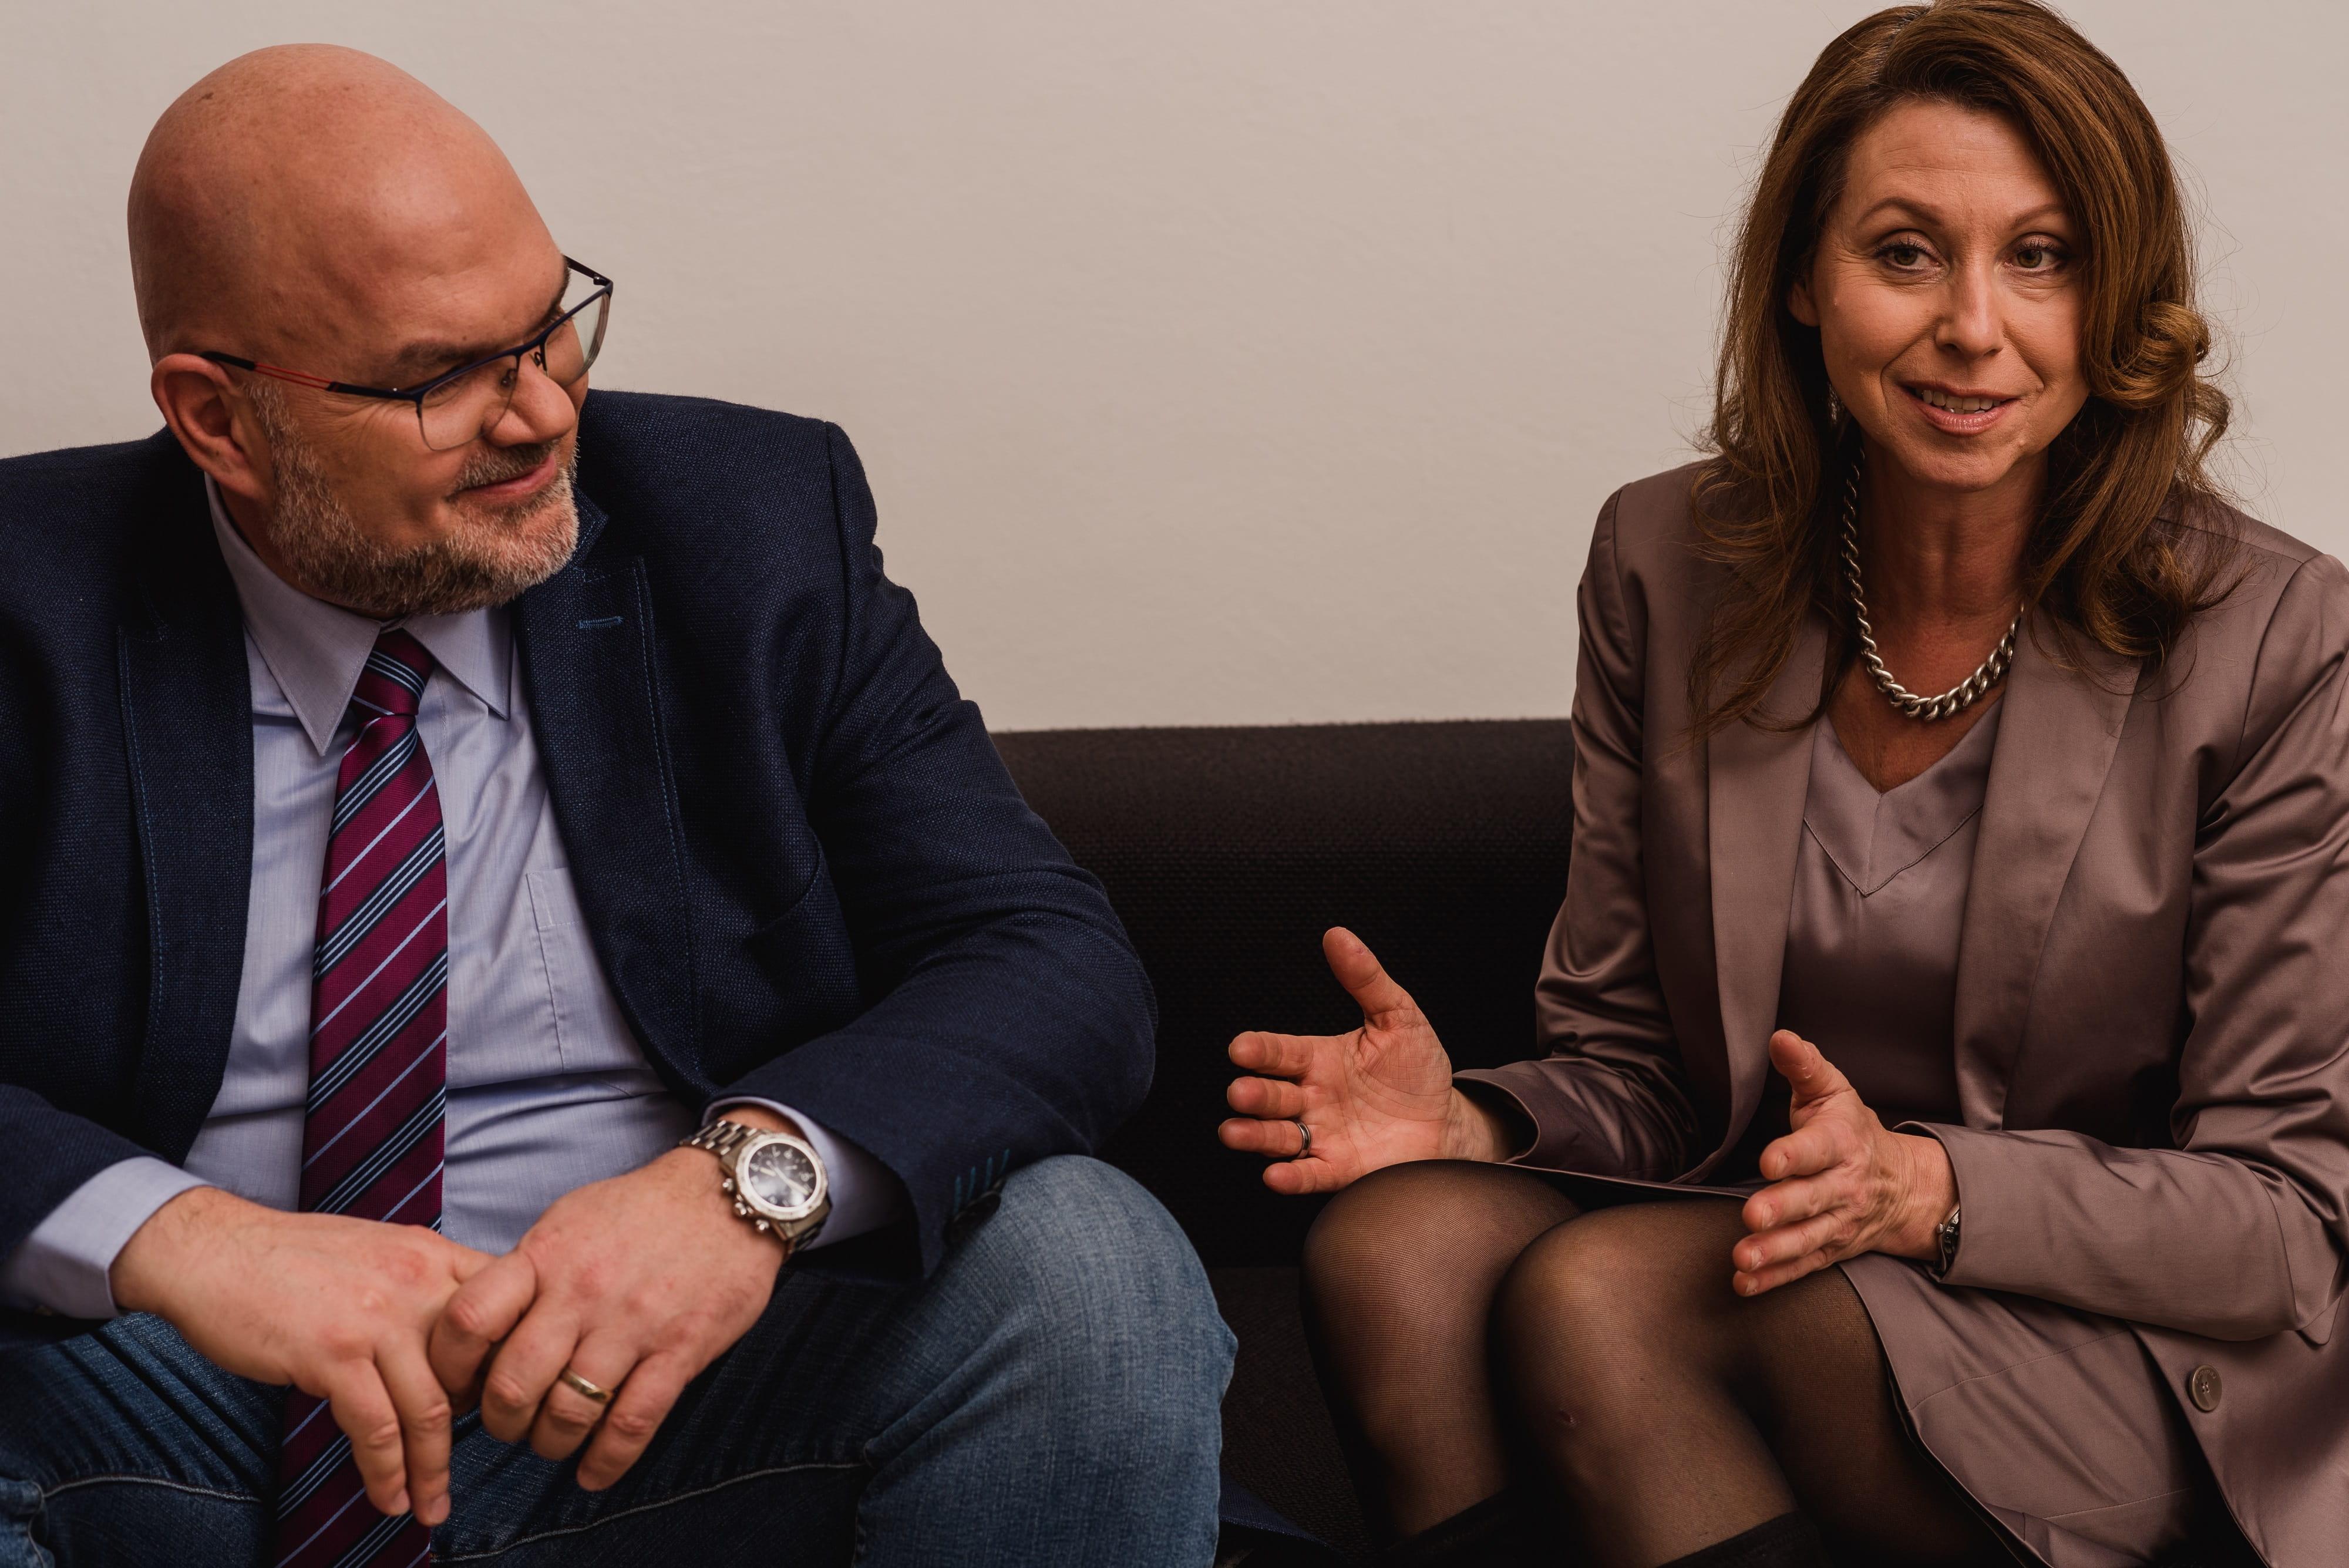 Dr. Hardo Fischer AveXis Regional Medical Director, Dr. Elisabeth Kukovetz AveXis Country Manager Austria (c) belle&sass